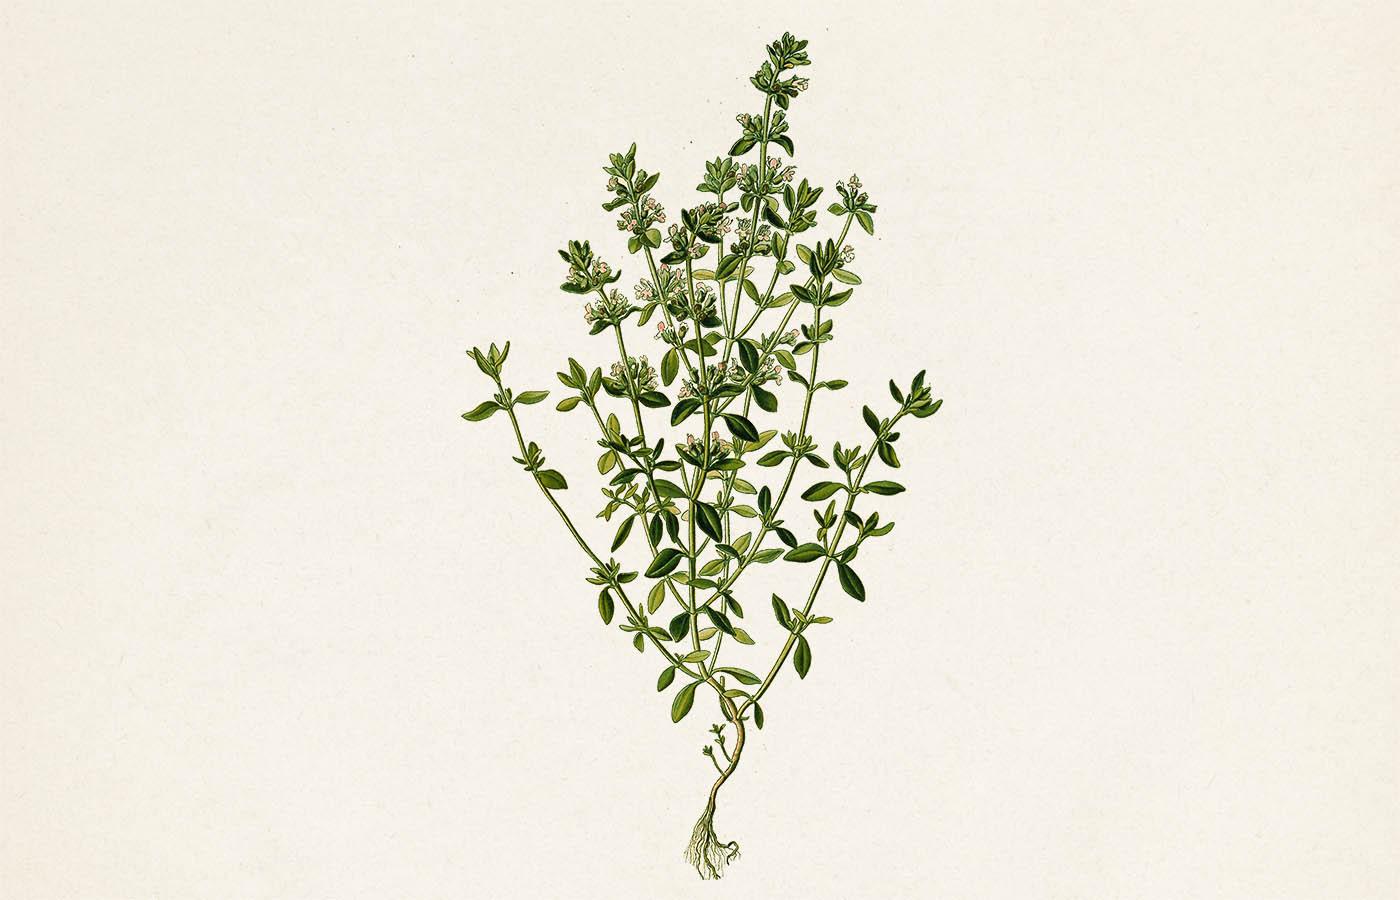 Mateřídouška obecná (Thymus vulgaris)